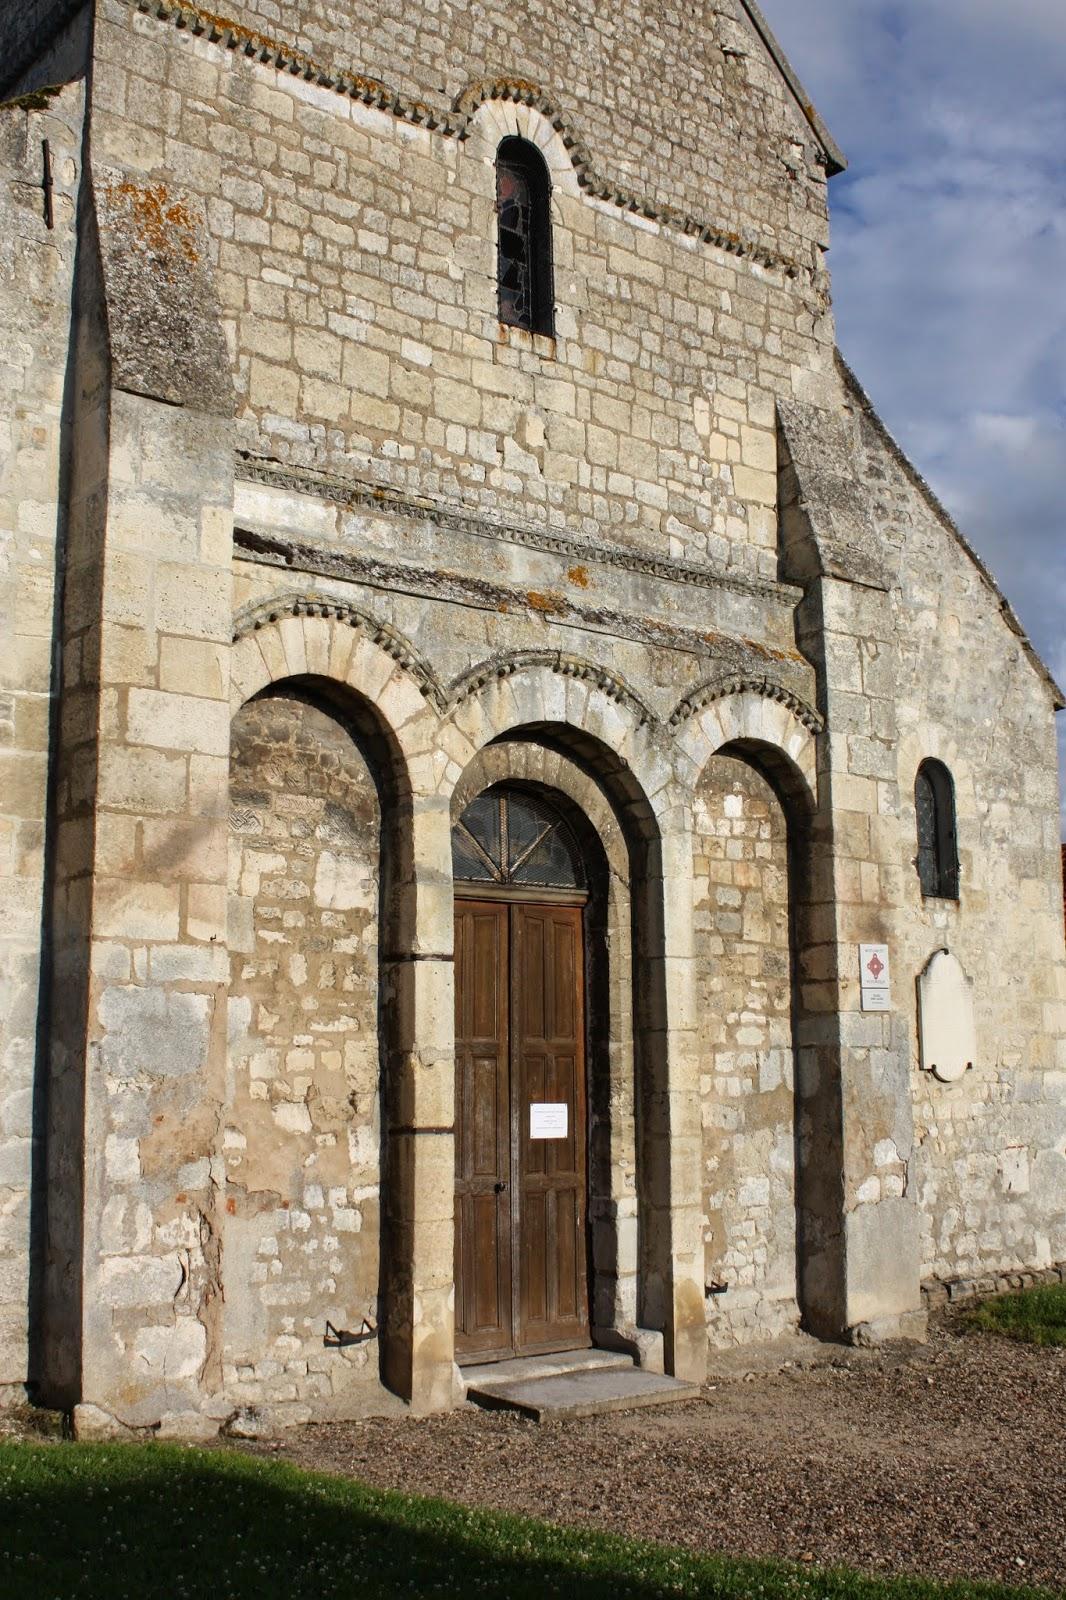 pont sainte maxence ancienne glise saint lucien de sarron 60 aglise saint lucien de